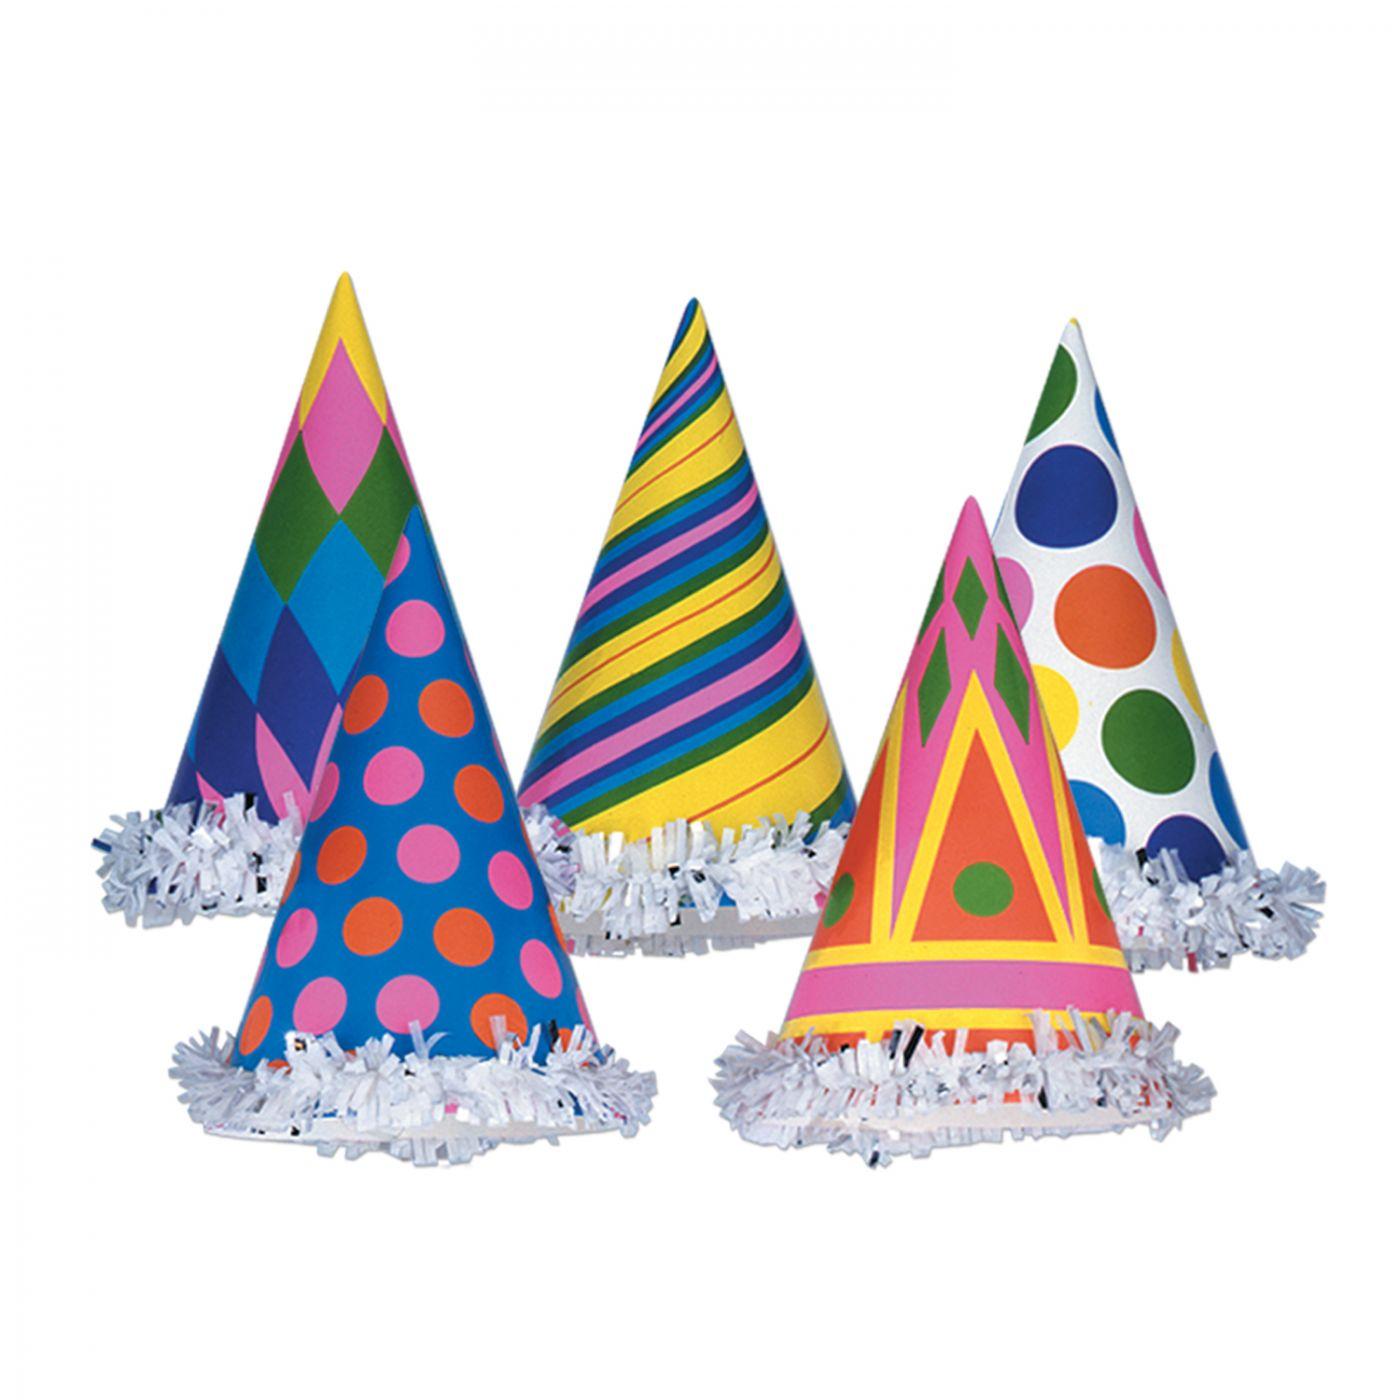 Fringed Cone Hats (144) image